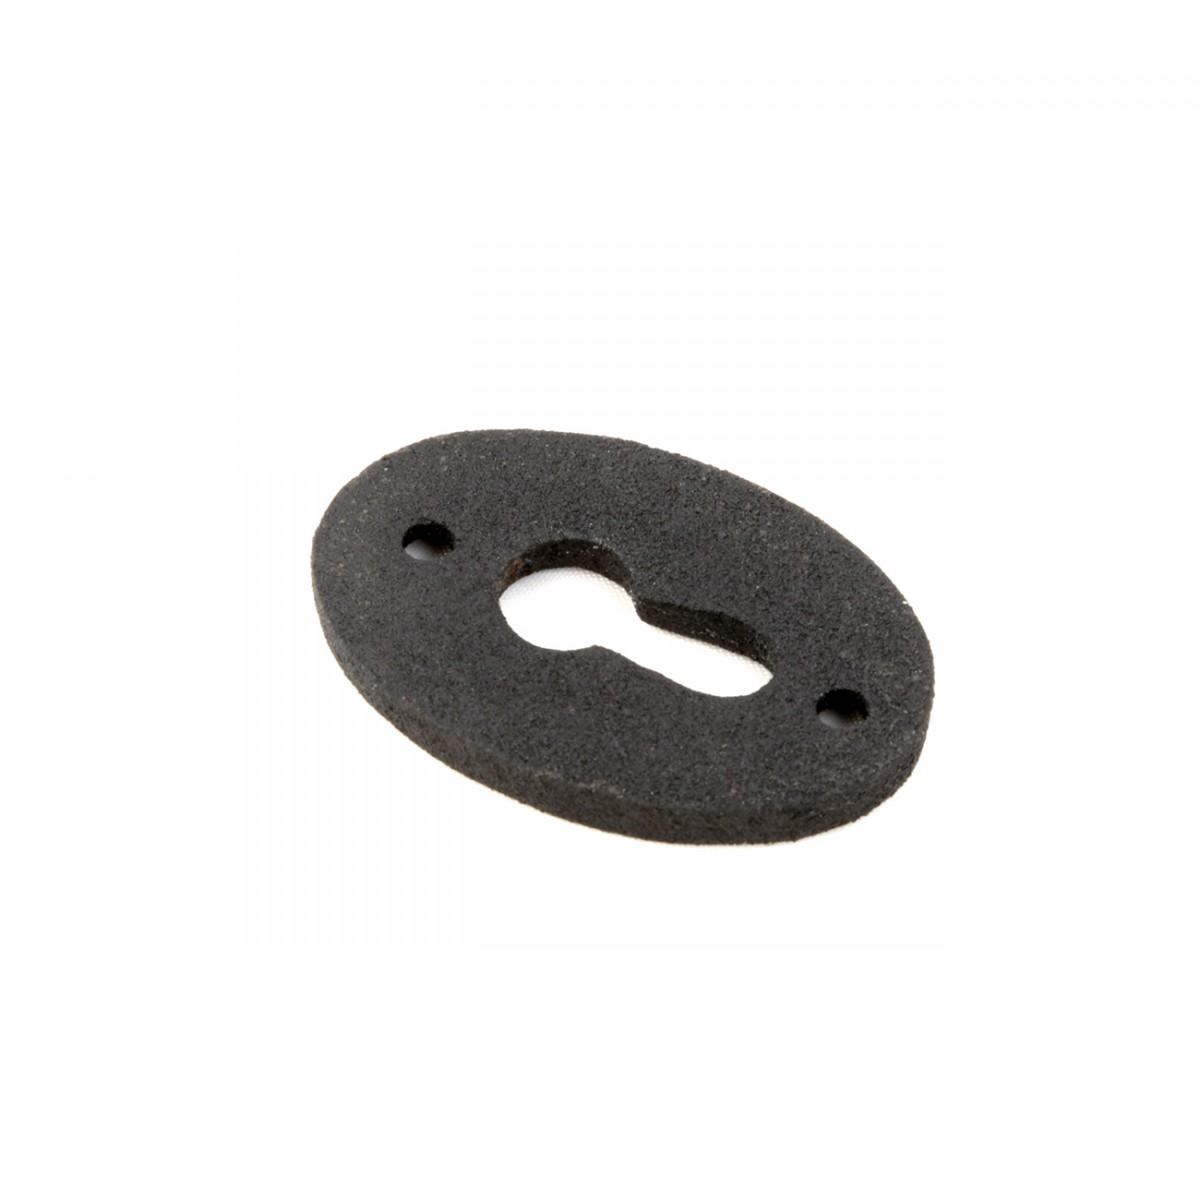 Wrought Iron Keyhole Cover Escutcheon Replacement 134 H Pack of 12 Escutcheons Keyholes Escutcheon